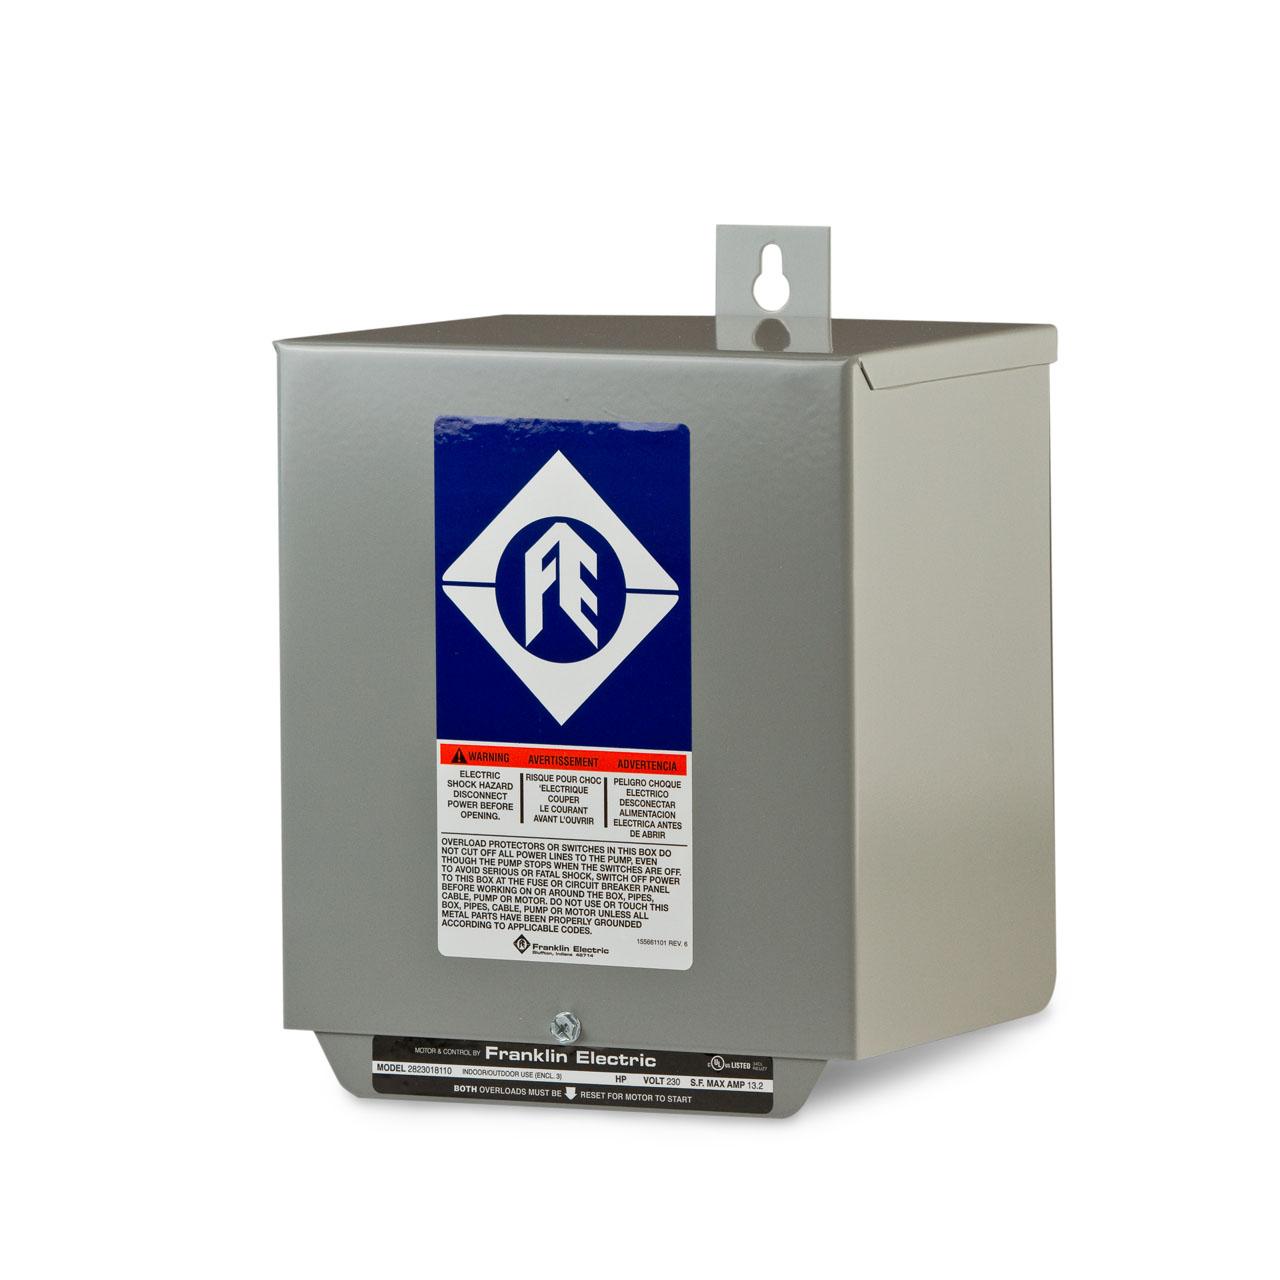 franklin well pump control box wiring diagram durango power steering 1 5 hp electric free